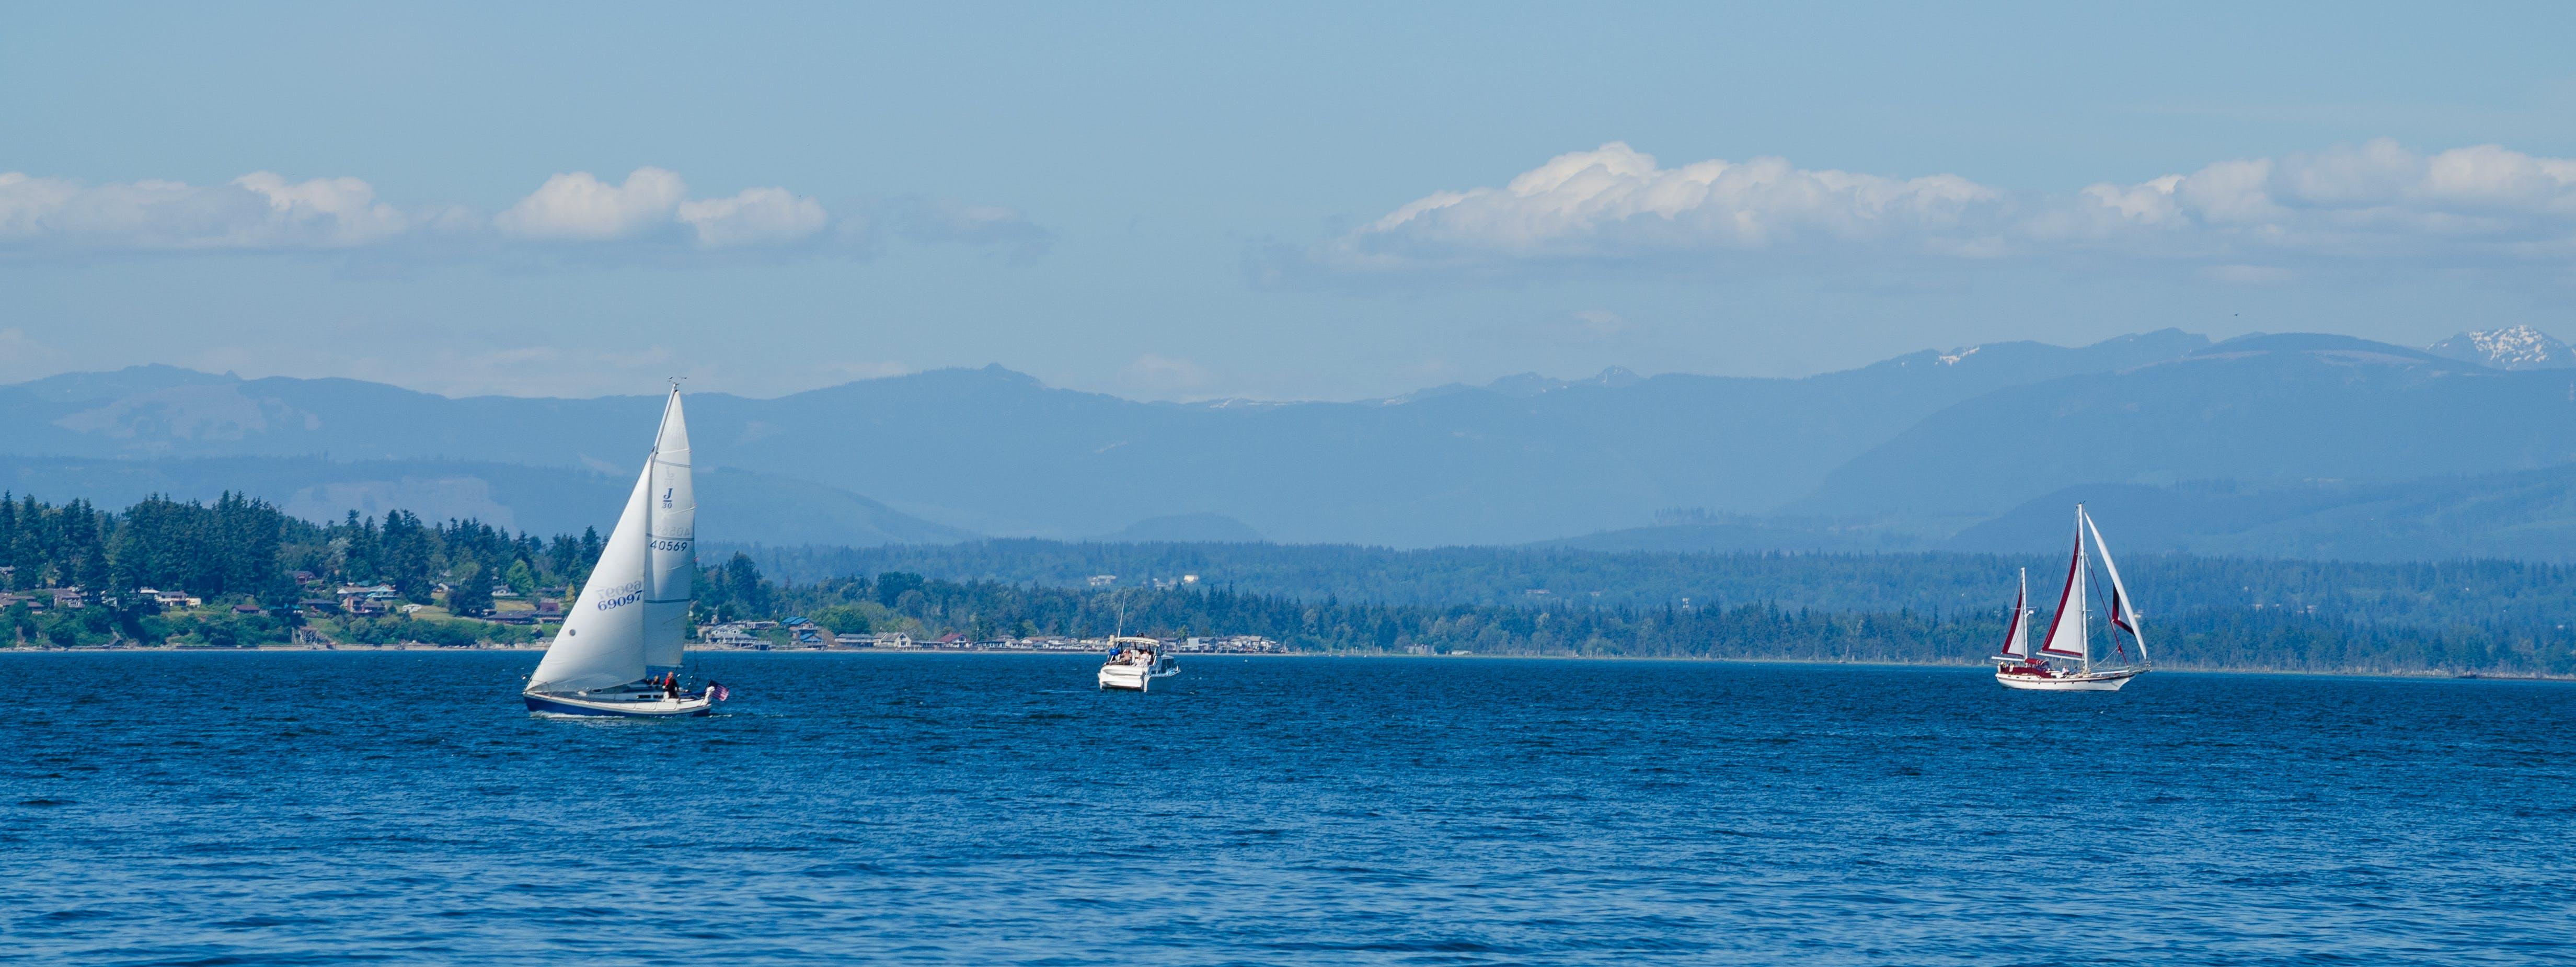 Free stock photo of blue, boats, everett washington, mountains